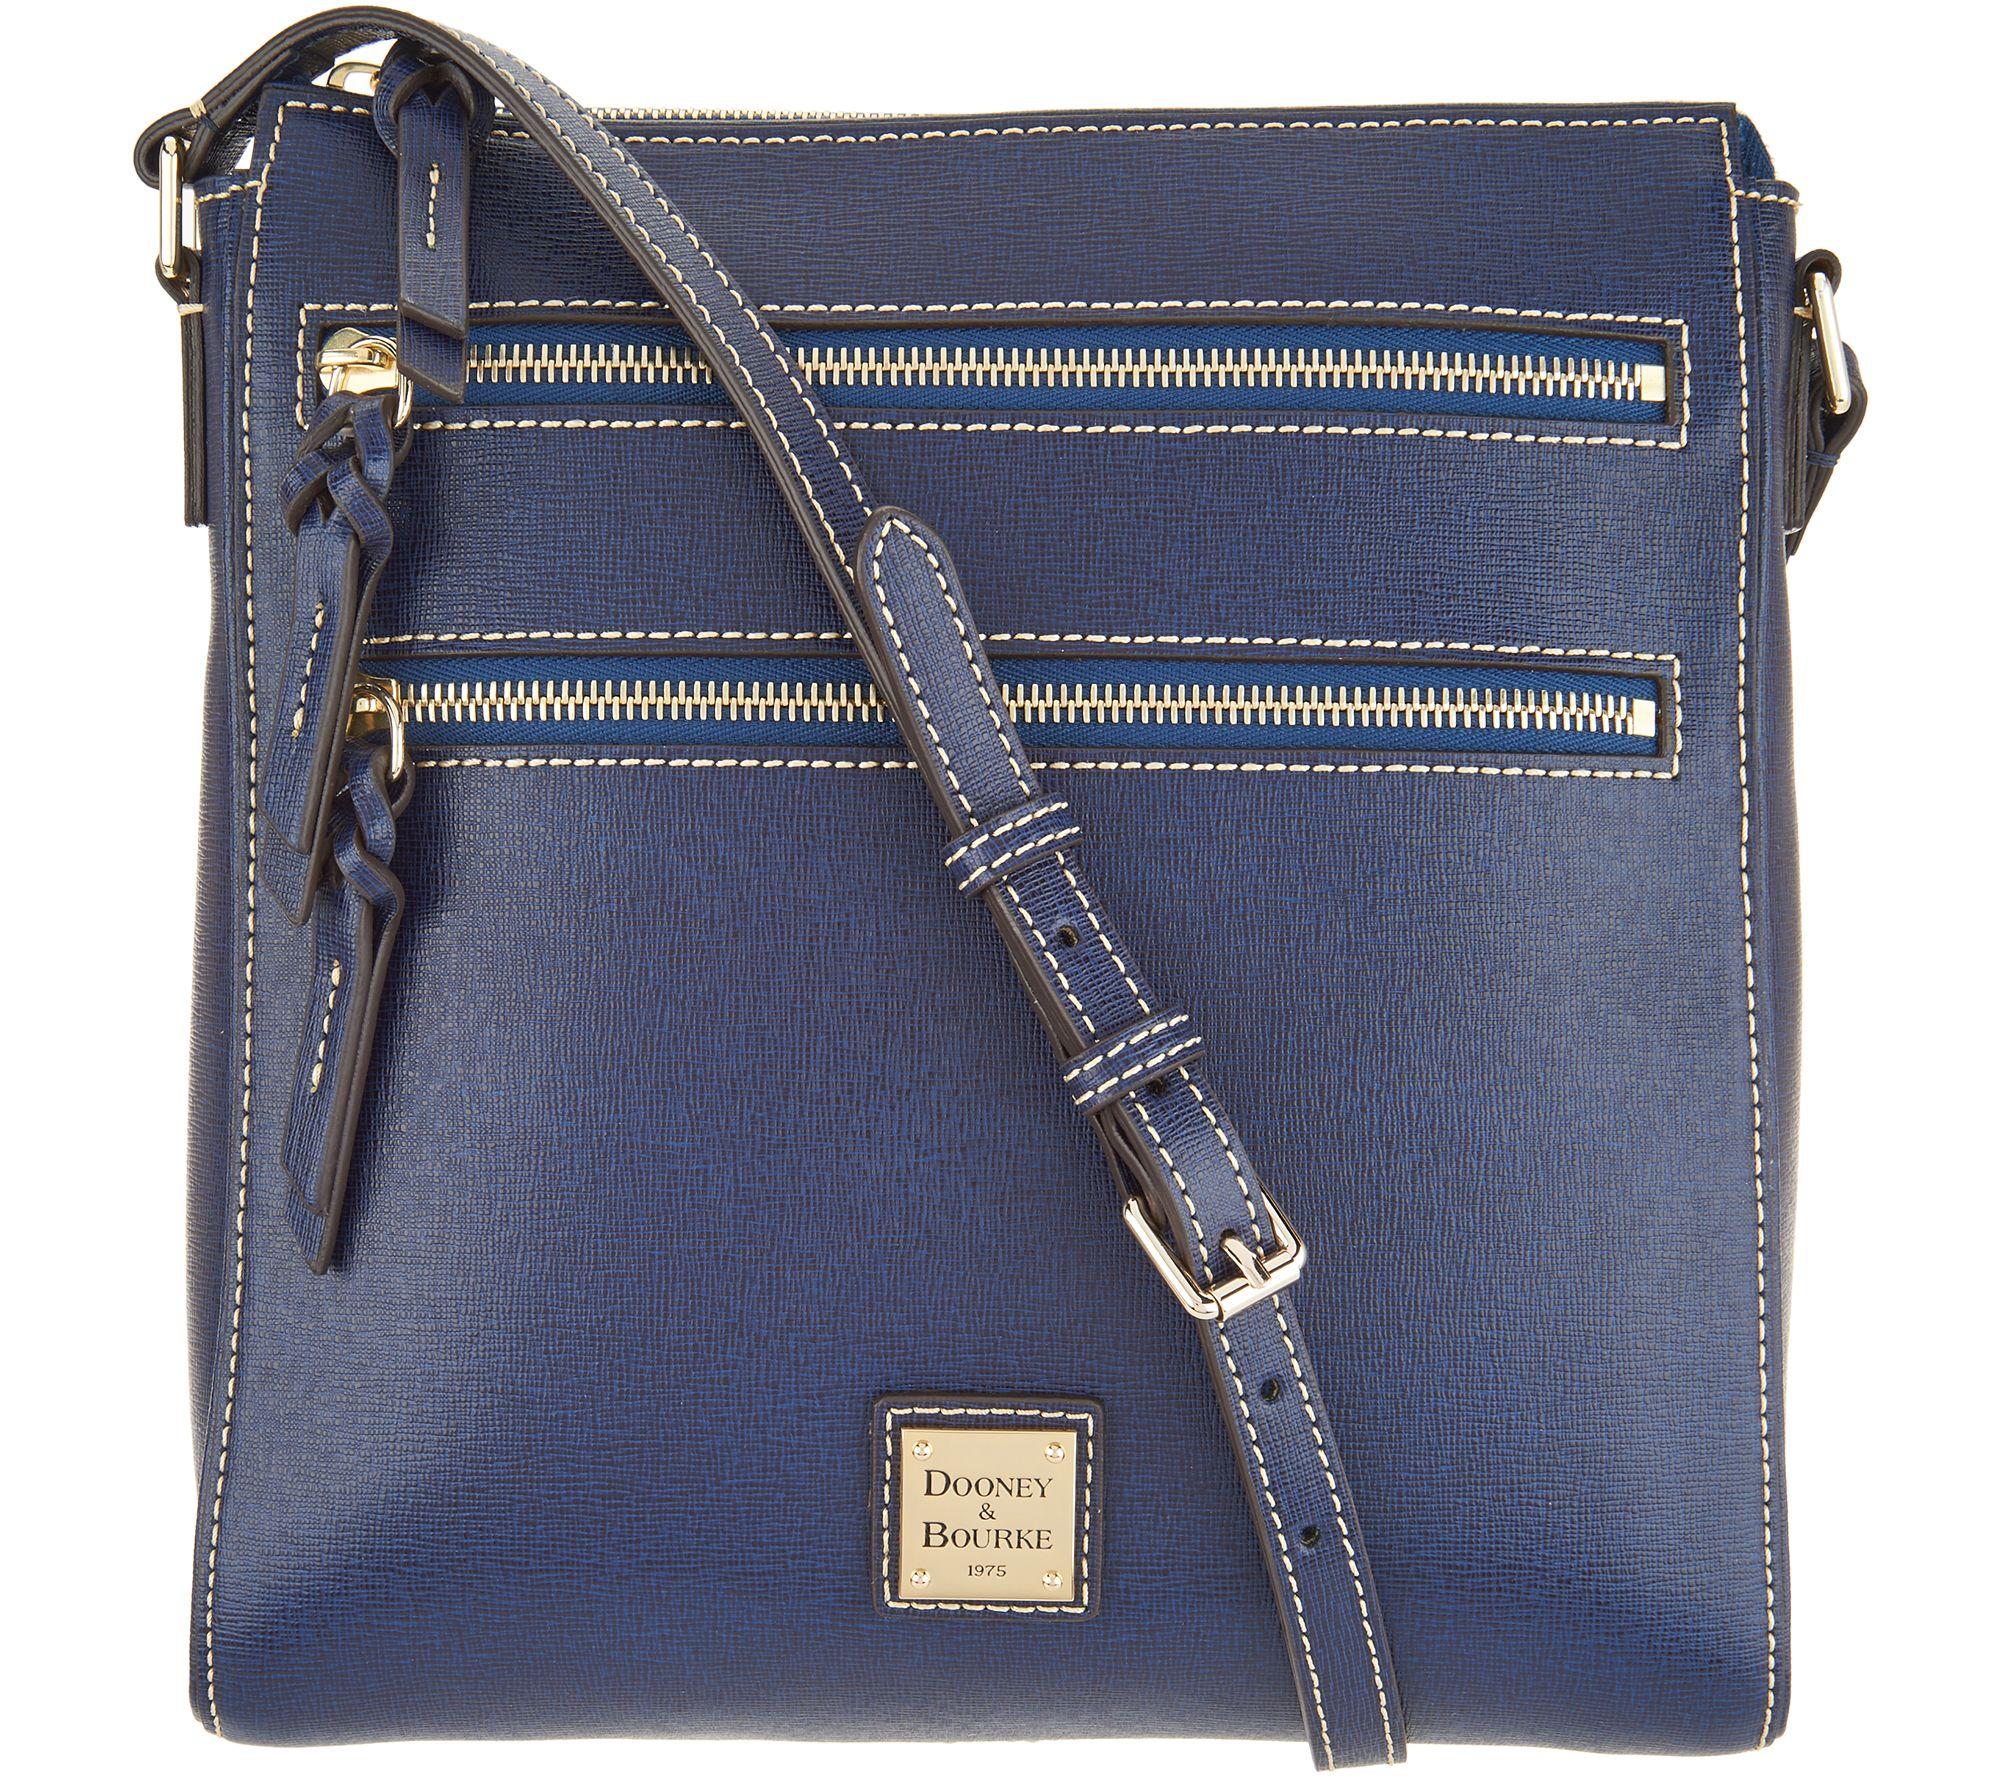 333fa50b5c Dooney   Bourke Saffiano Leather Triple Zip Crossbody Handbag - Page 1 —  QVC.com